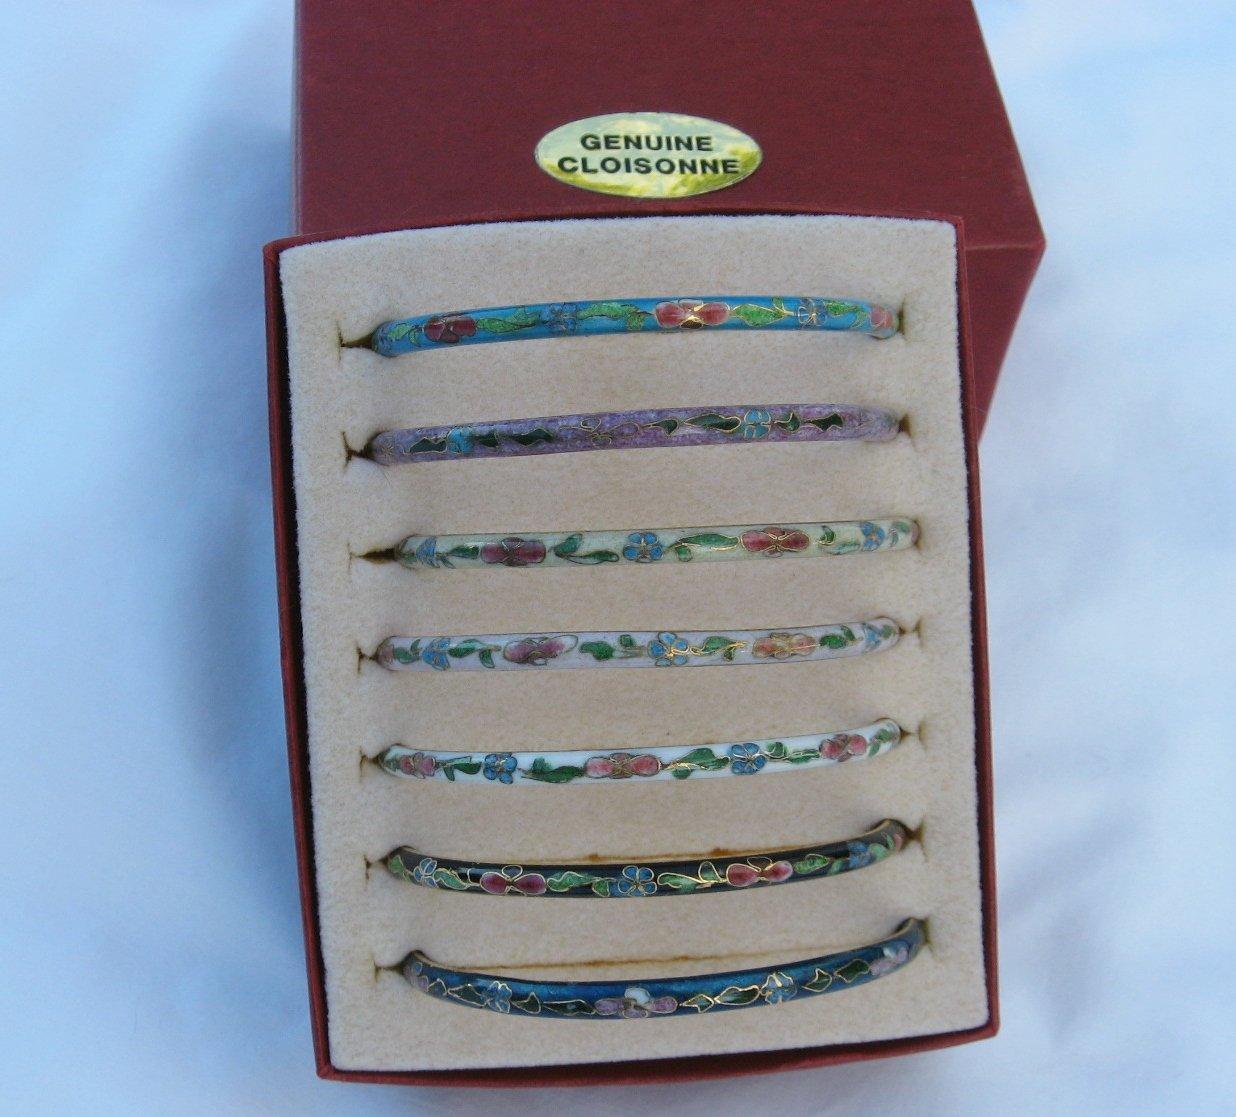 7 Cloisonne Bangles Bracelets 2 3/4 Diameter Genuine